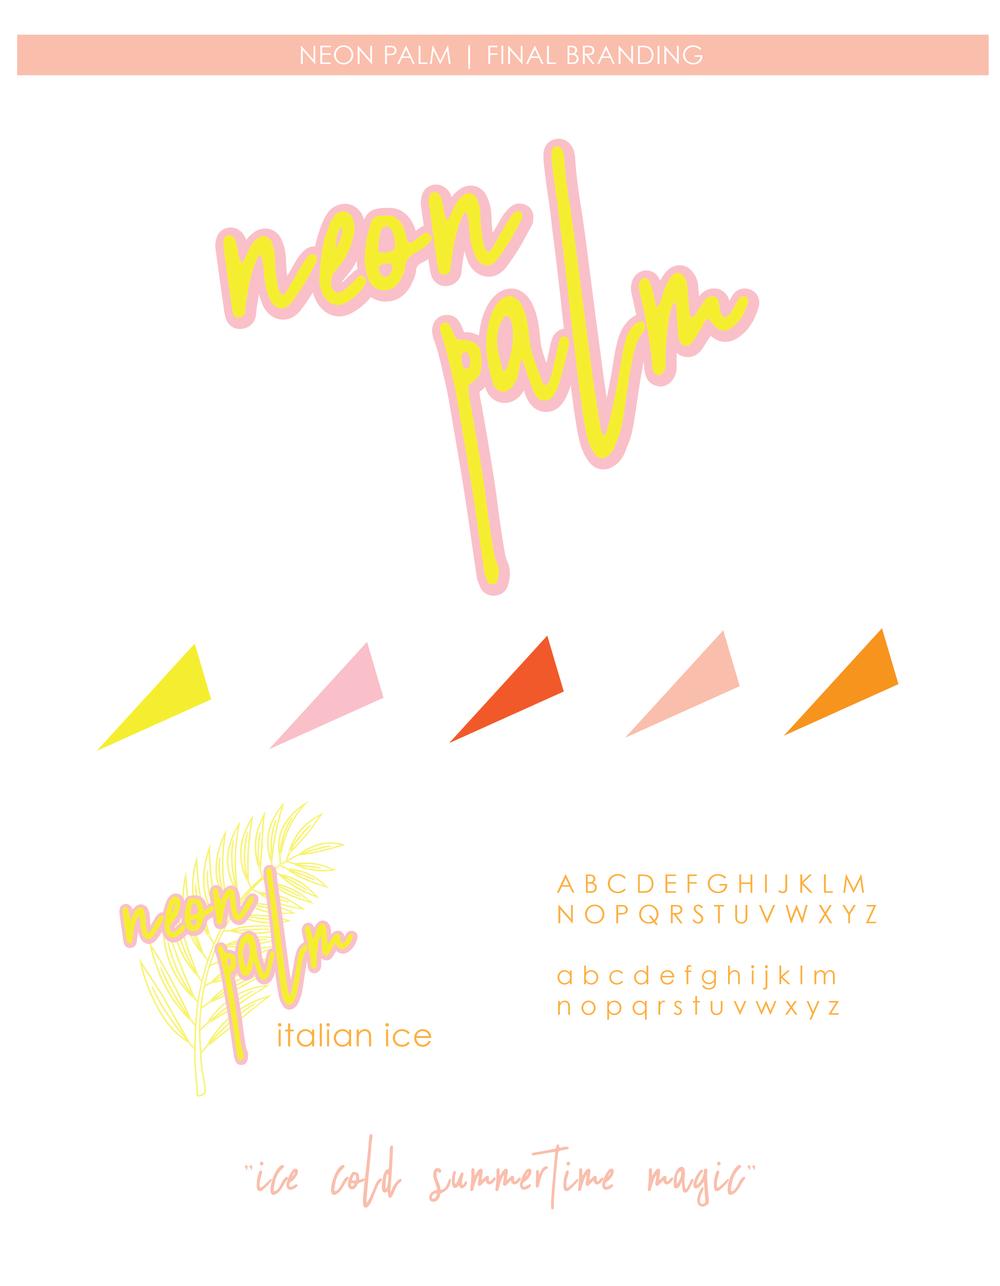 NeonPalm_MoodBoard2-01.png